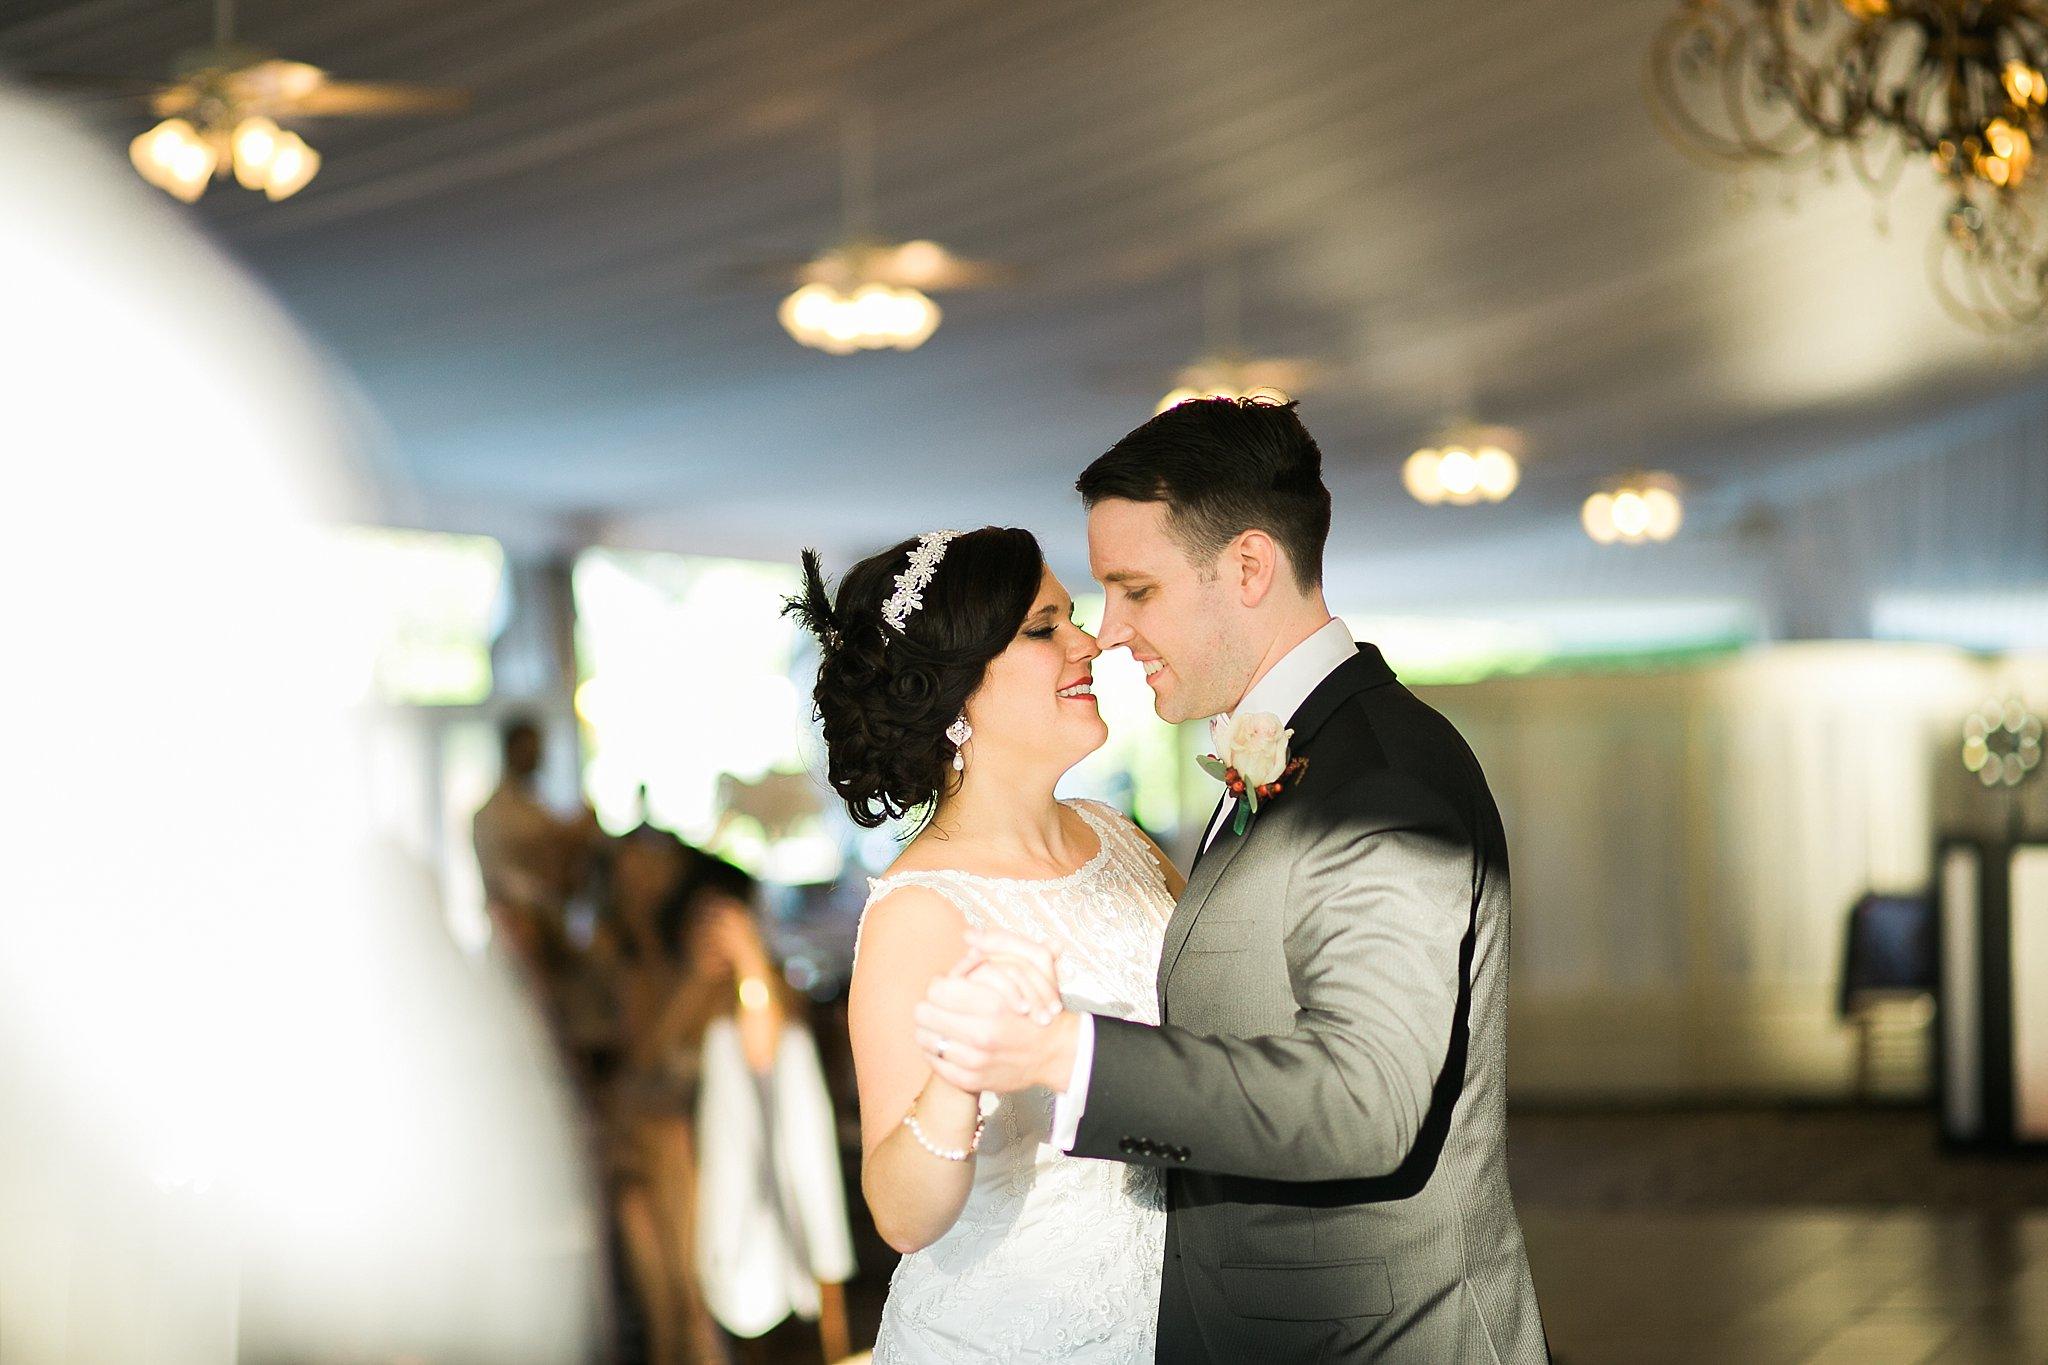 West Hills Country Club Wedding Gatsby Wedding Roaring Twenties Wedding Hudson Valley Wedding Photographer Sweet Alice Photography61.jpg